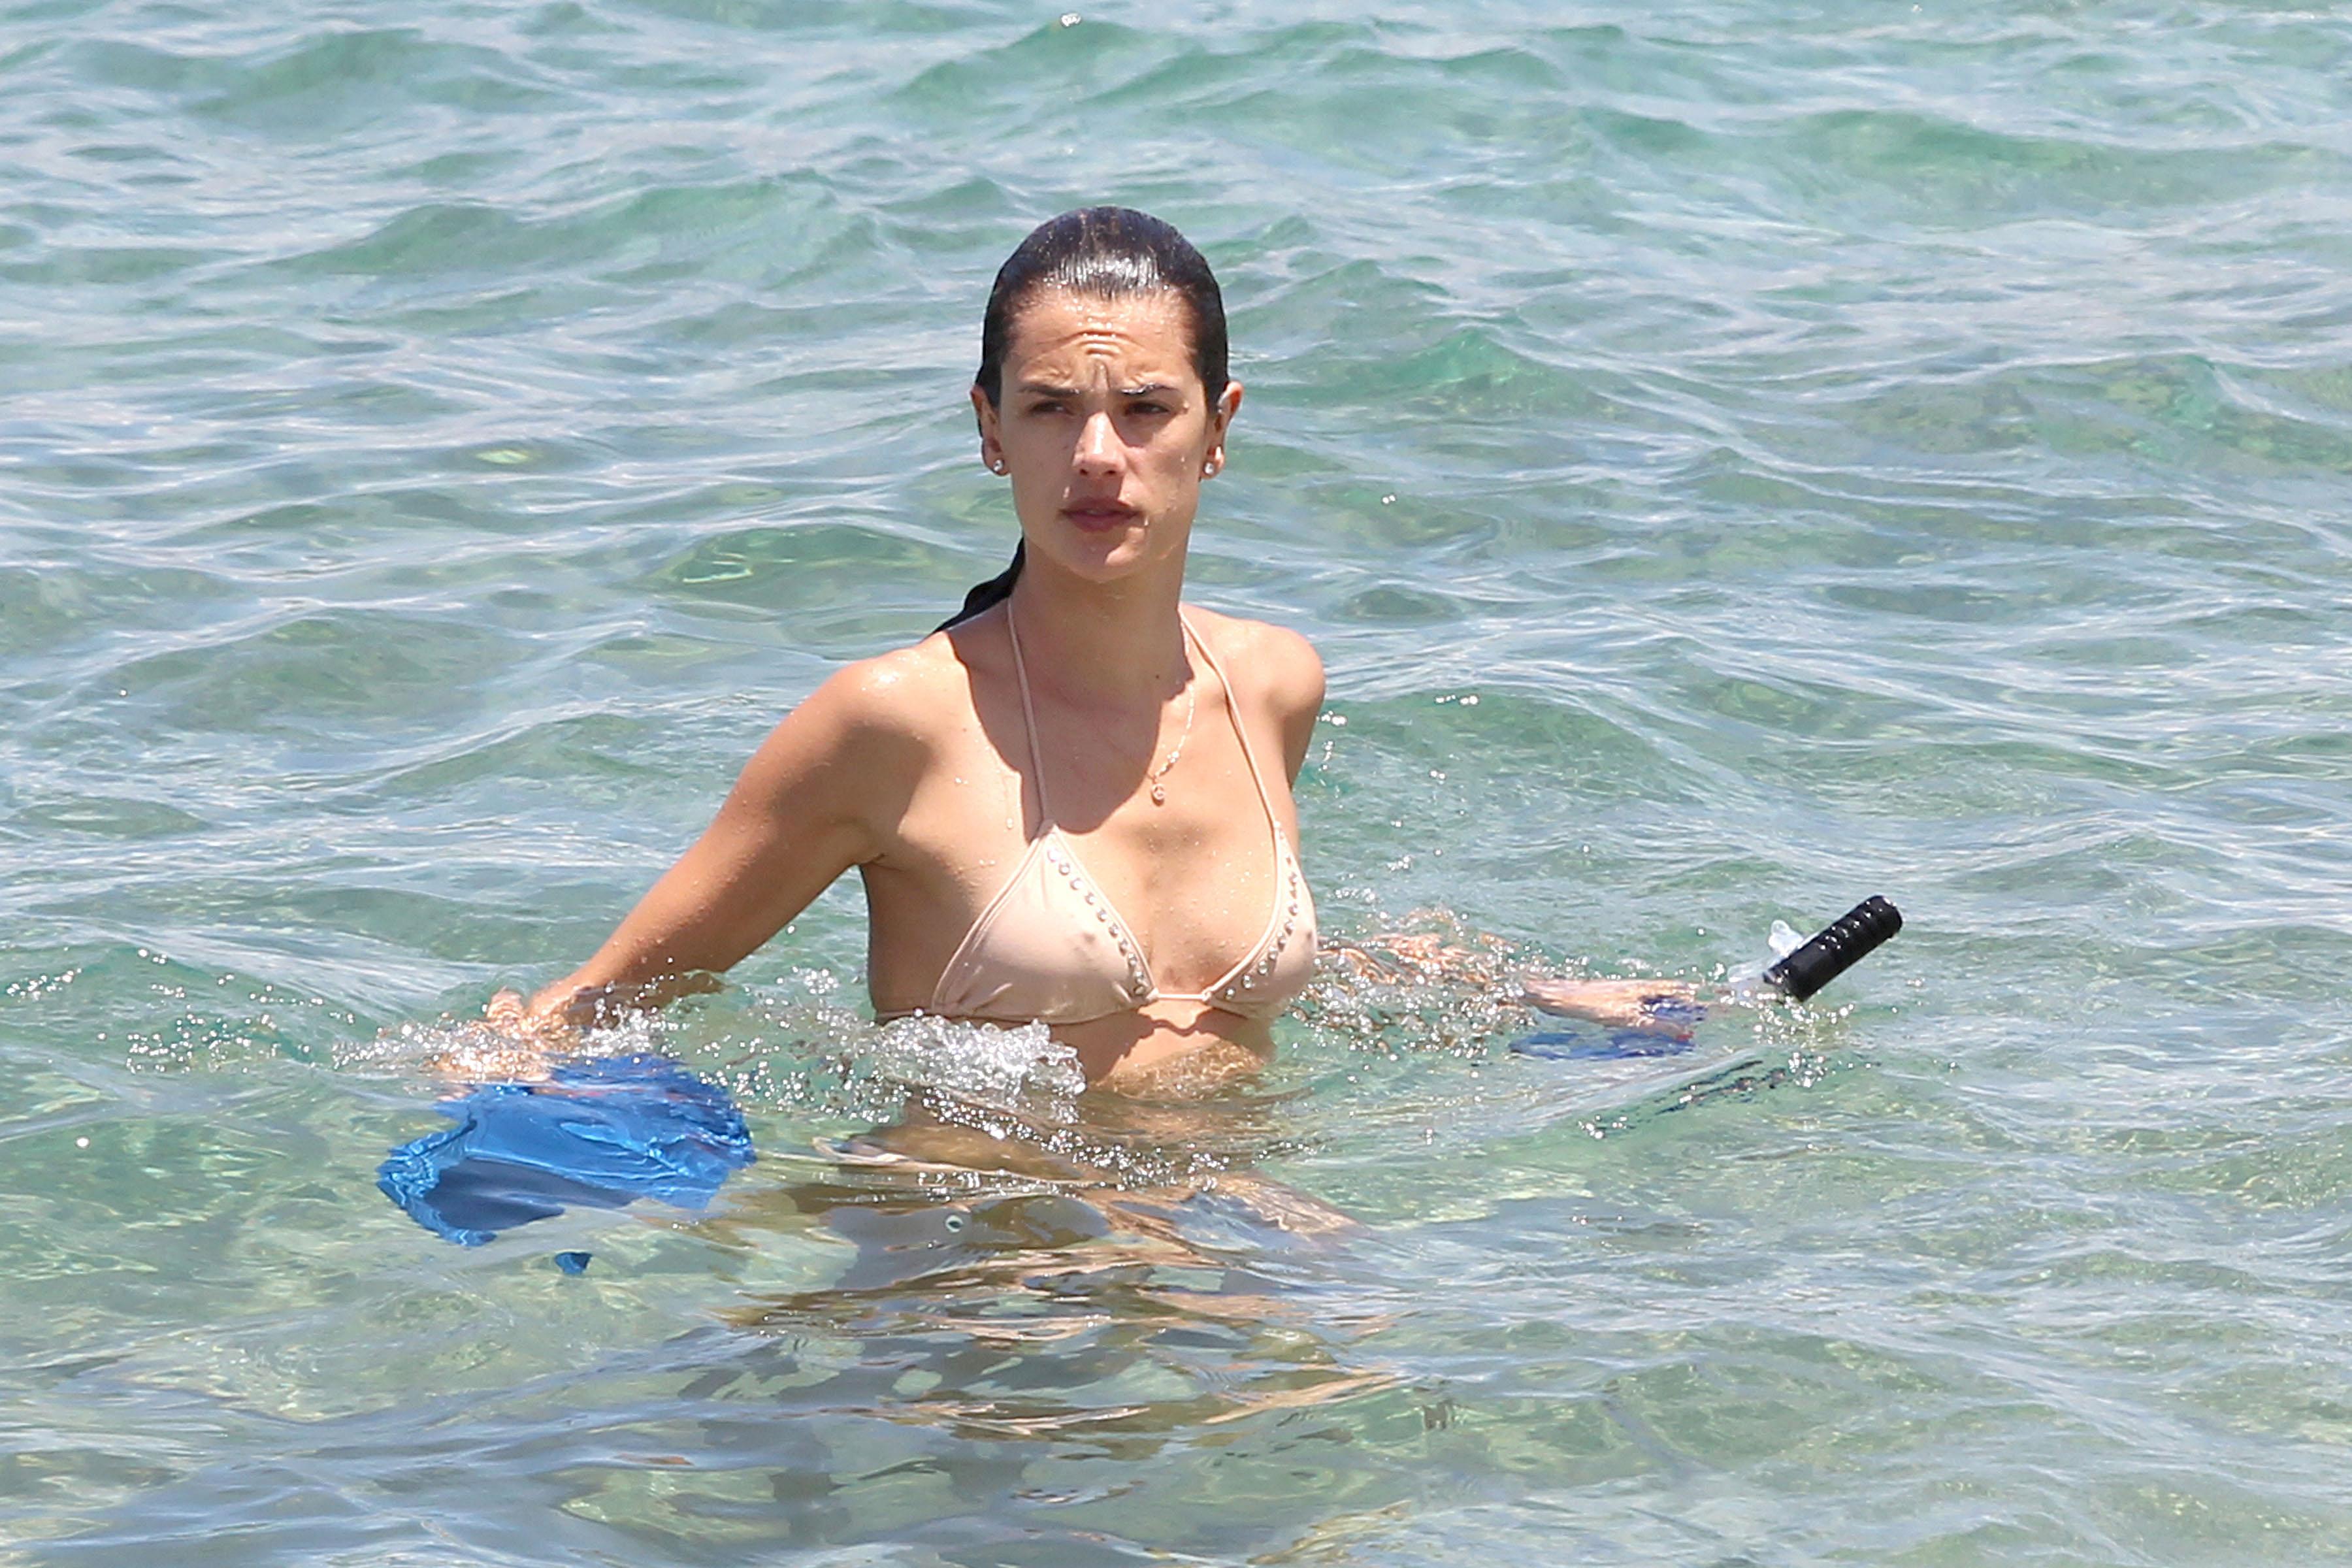 79687_Alessandra_Ambrosio_on_the_beach_in_Hawaii_3_122_494lo.jpg